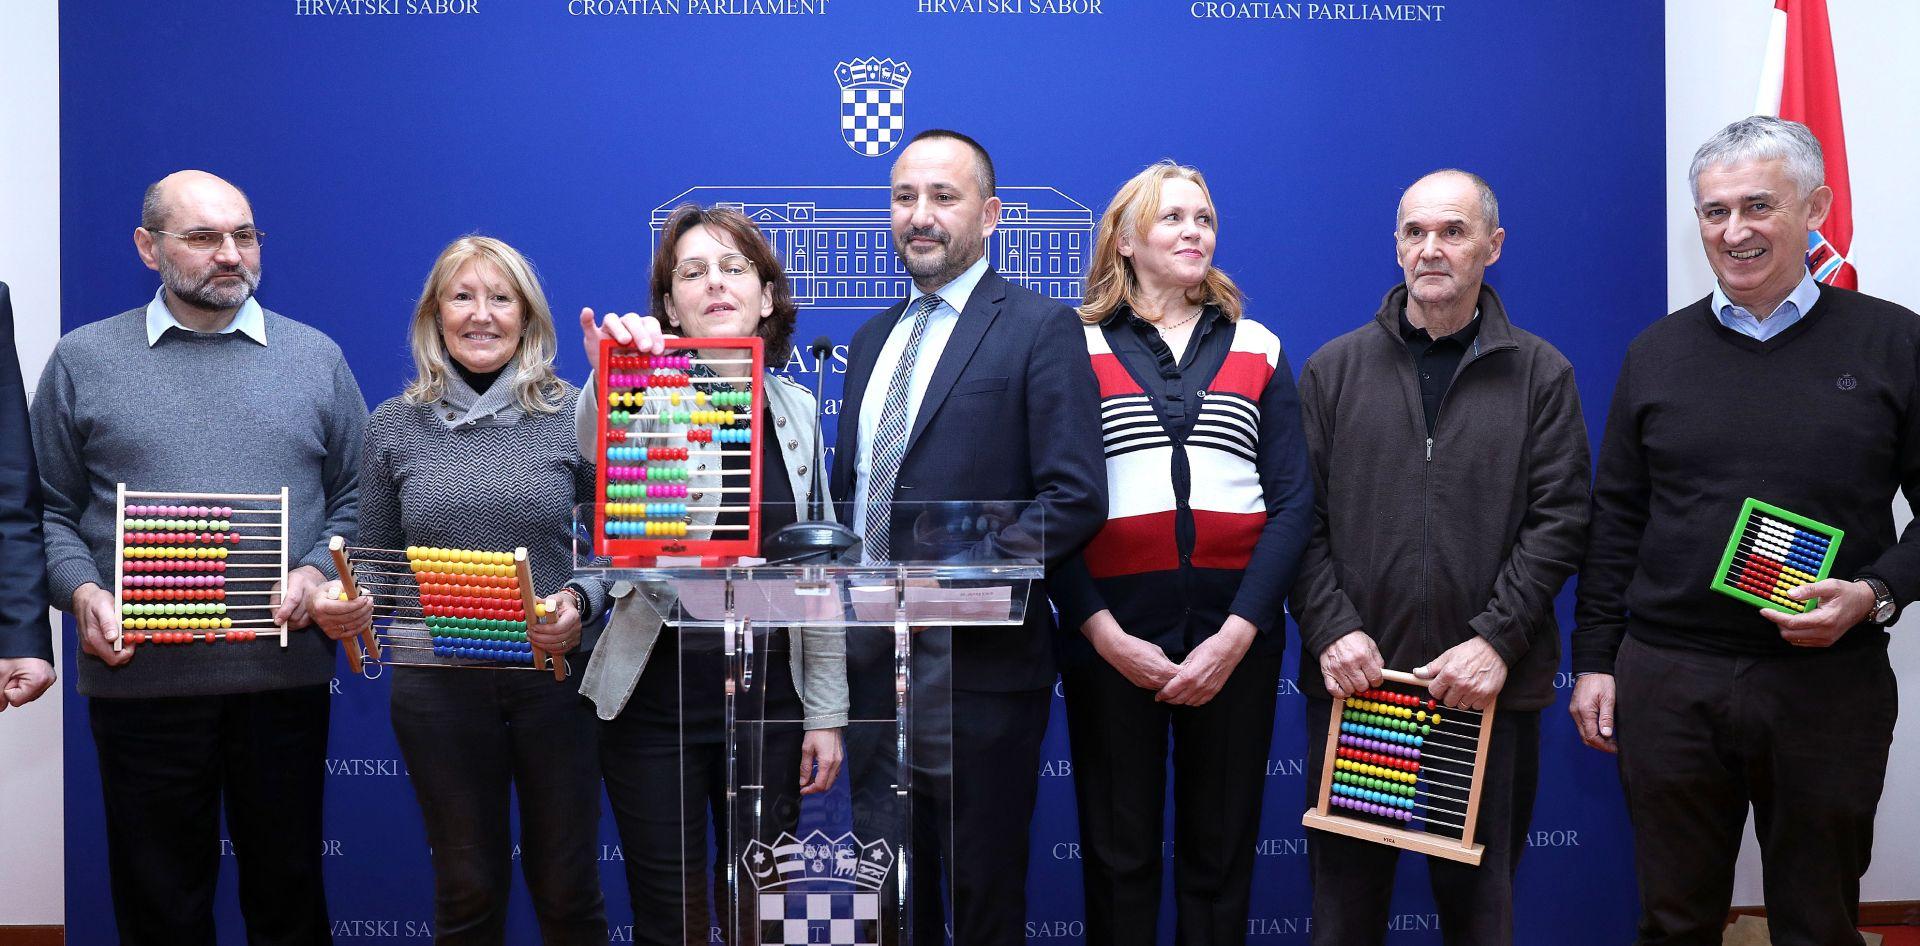 APIS Inicijatori referenduma pregledali popise